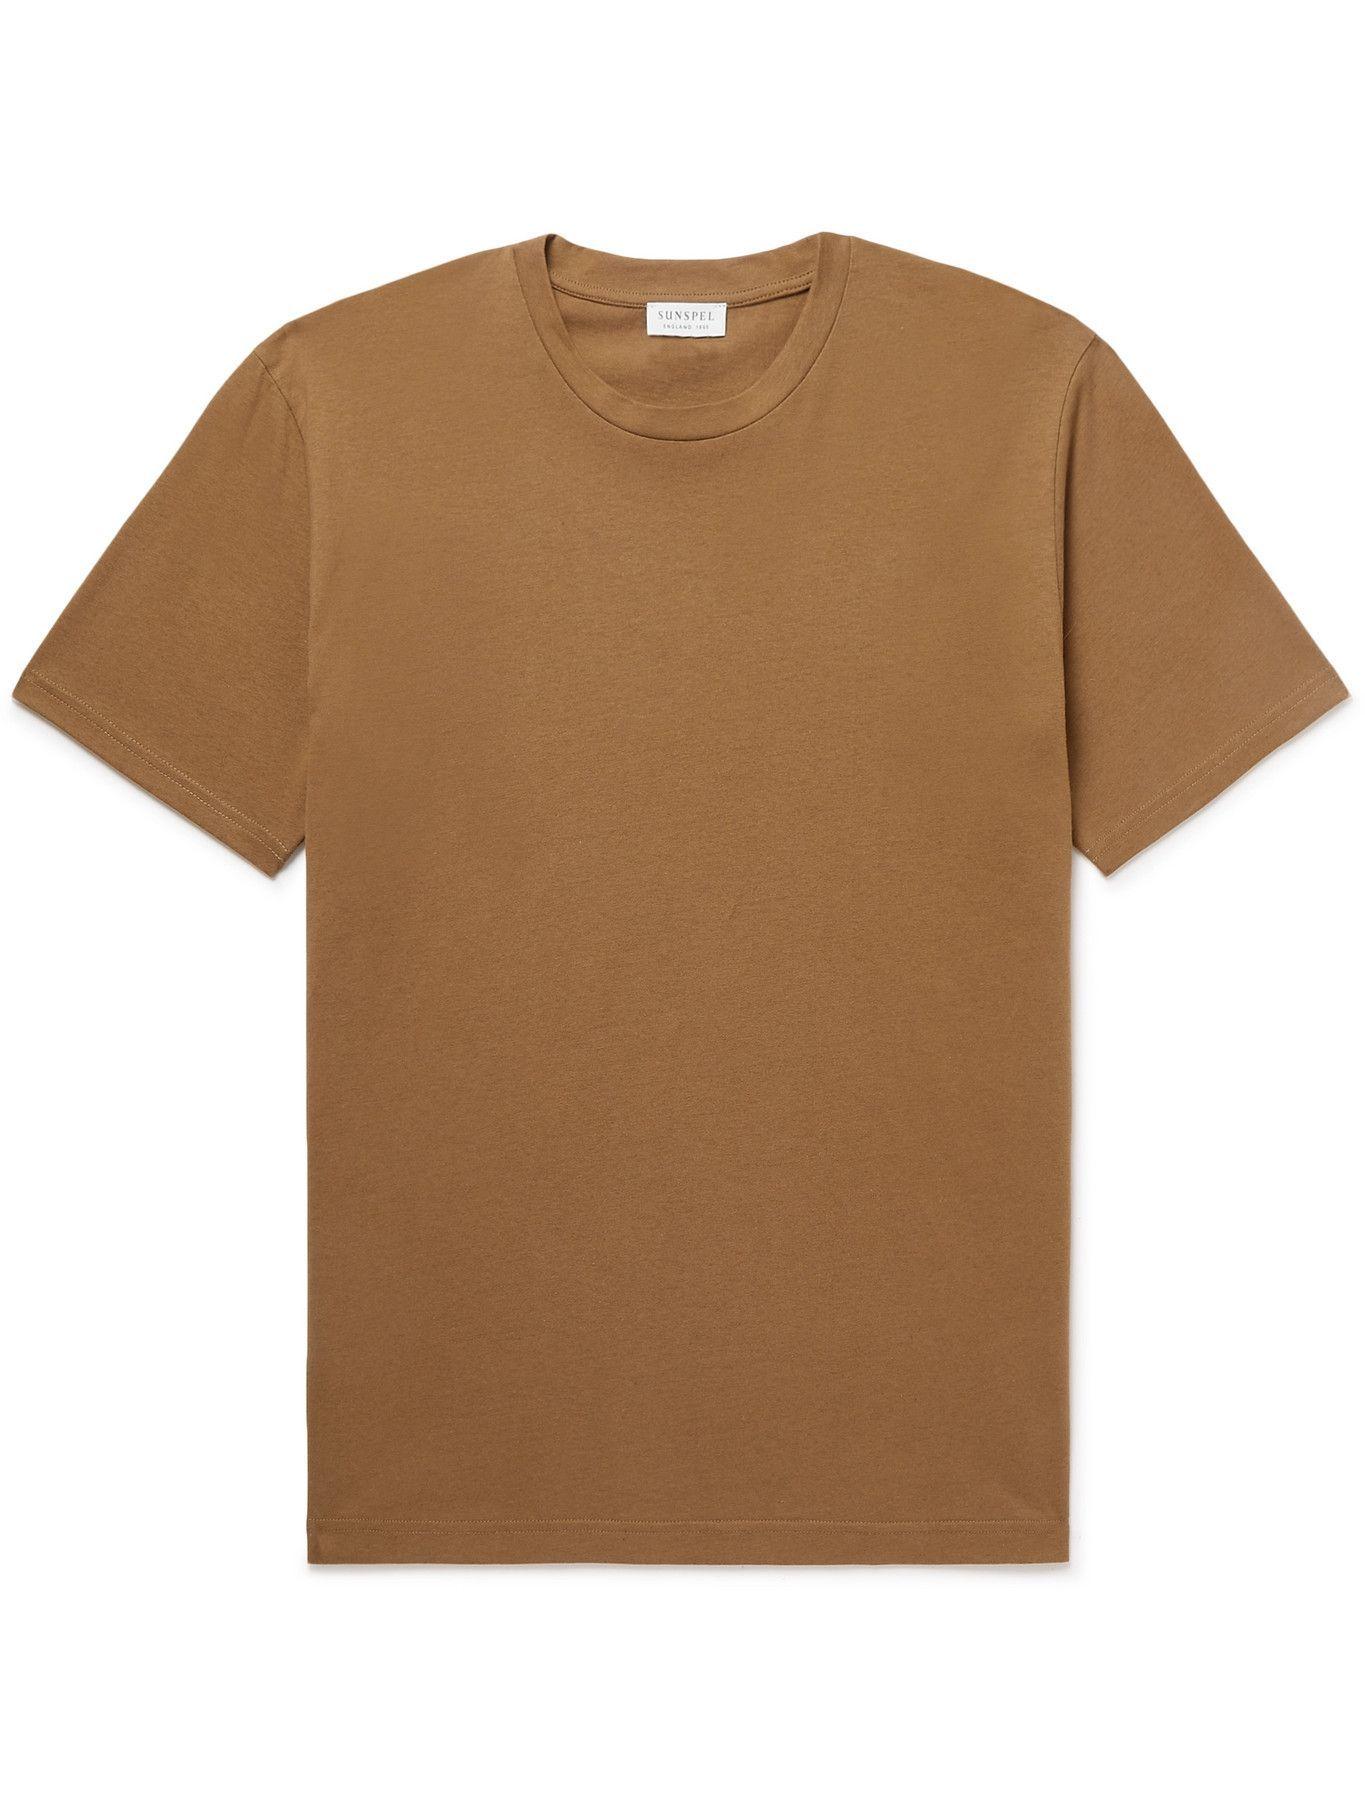 Photo: Sunspel - Riviera Cotton-Jersey T-Shirt - Brown